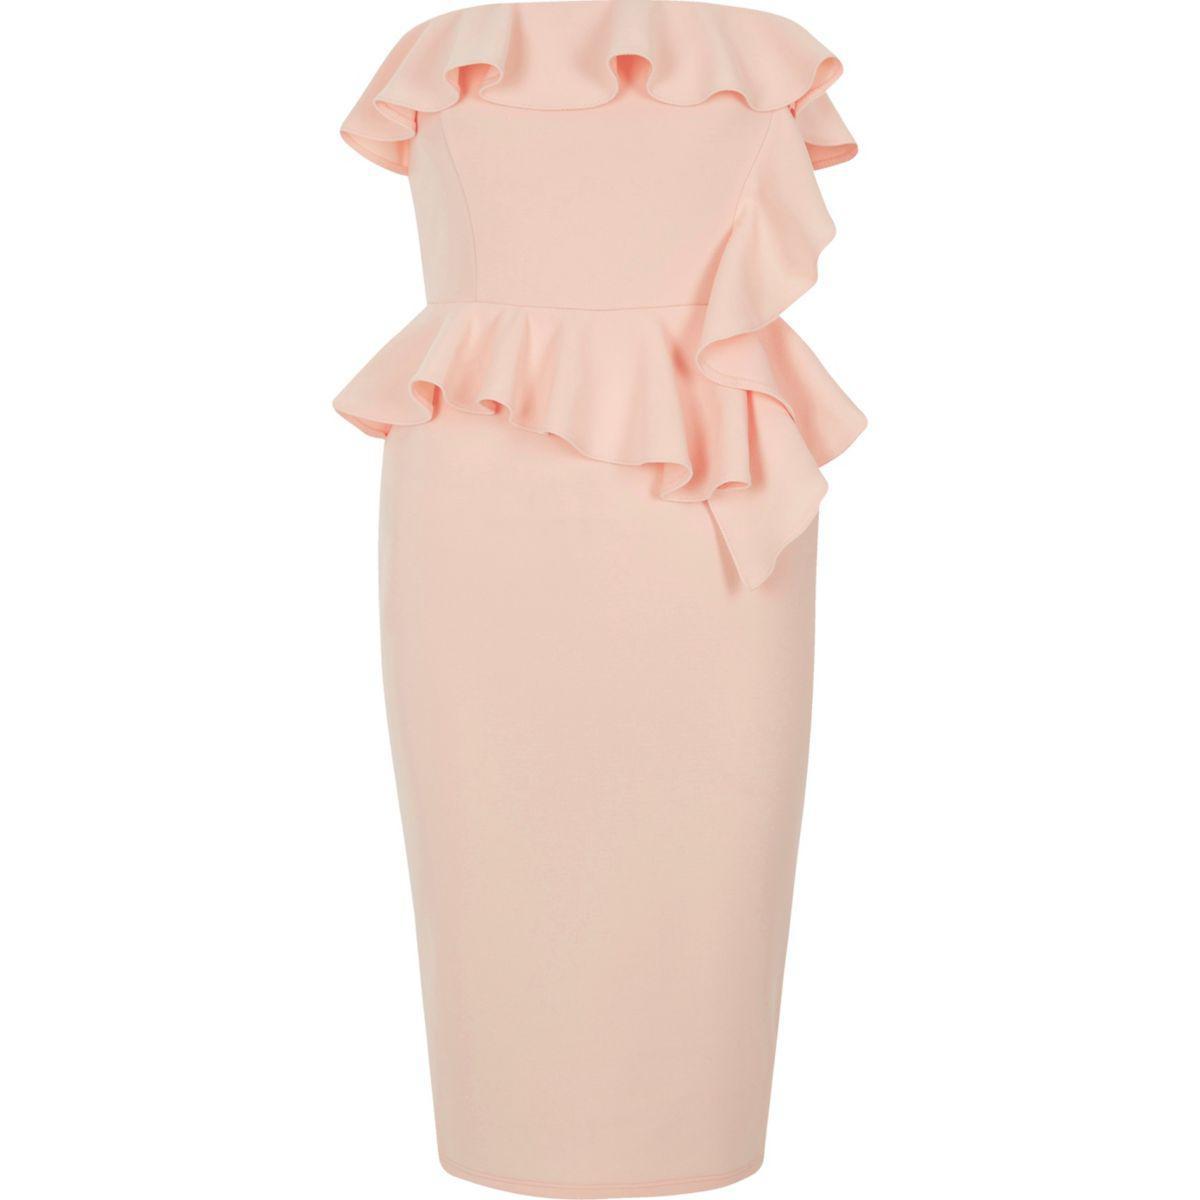 151ec7ca72b9 Lyst - River Island Light Pink Frill Strapless Bodycon Dress in Pink